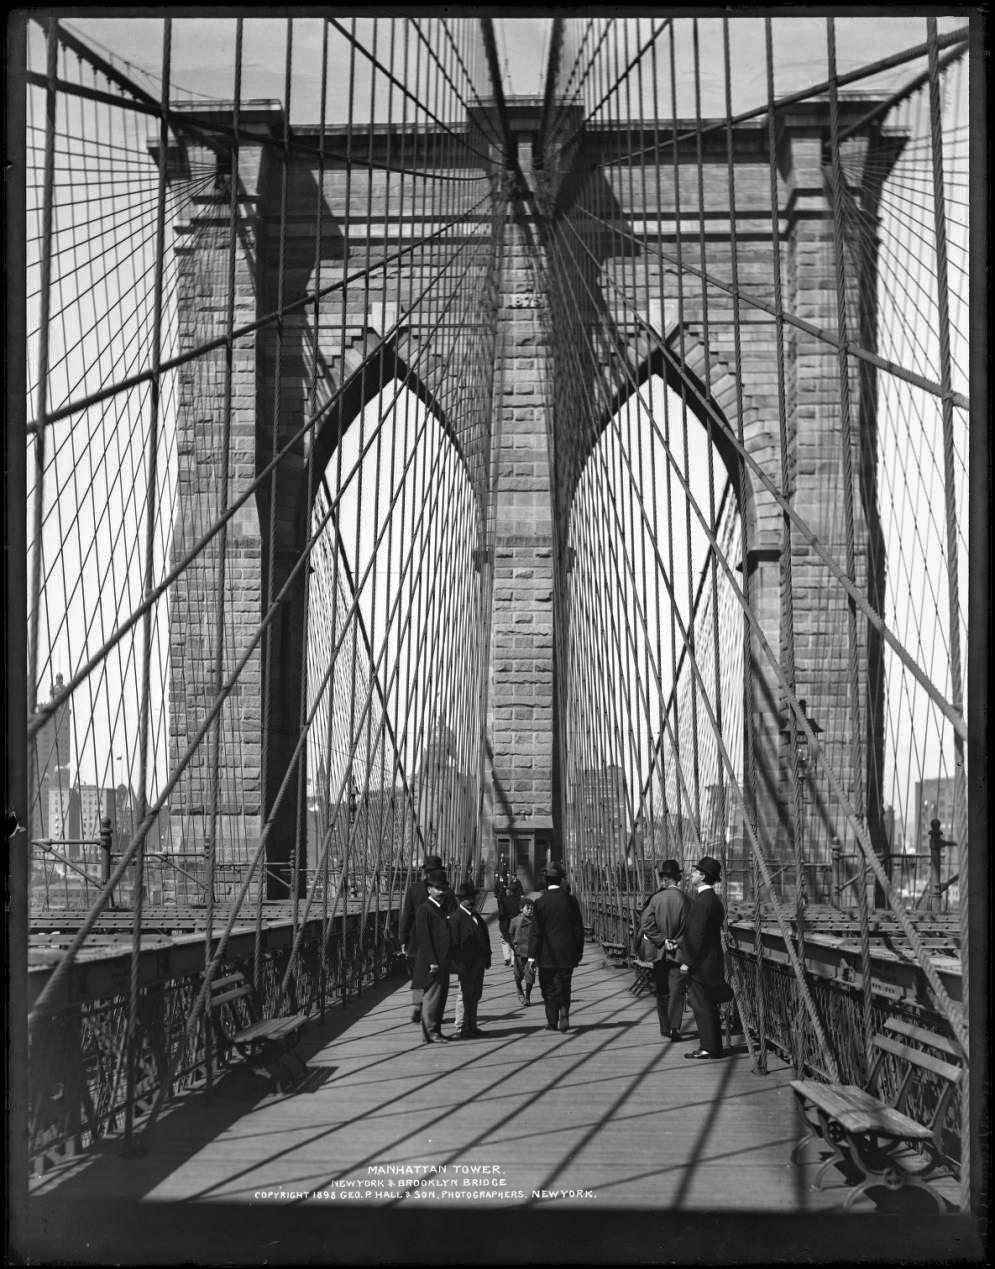 New York. The Manhattan Tower of the Brooklyn Bridge, 1898.